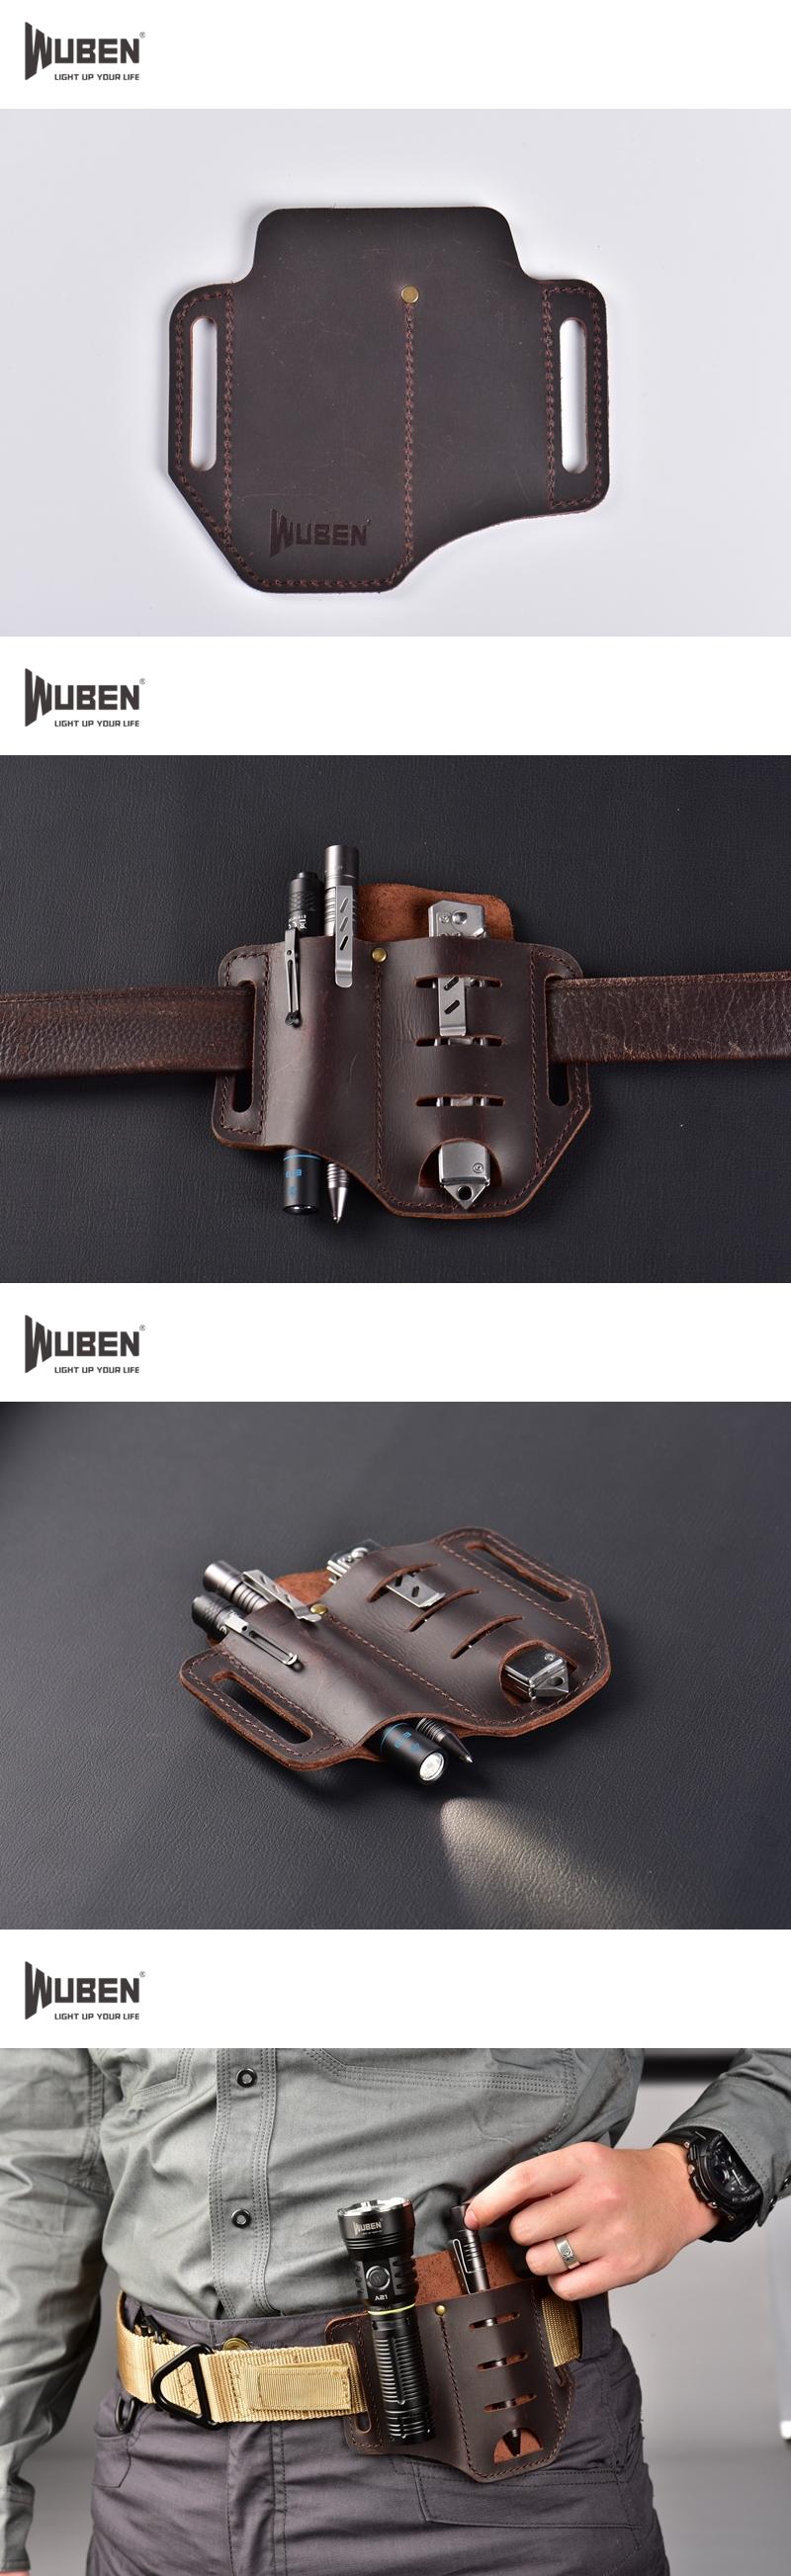 WUBEN HG6BR 質感皮革 男人的配件 工具袋 瘋馬皮 EDC手電筒 工具鉗 腰帶皮套 工具皮套